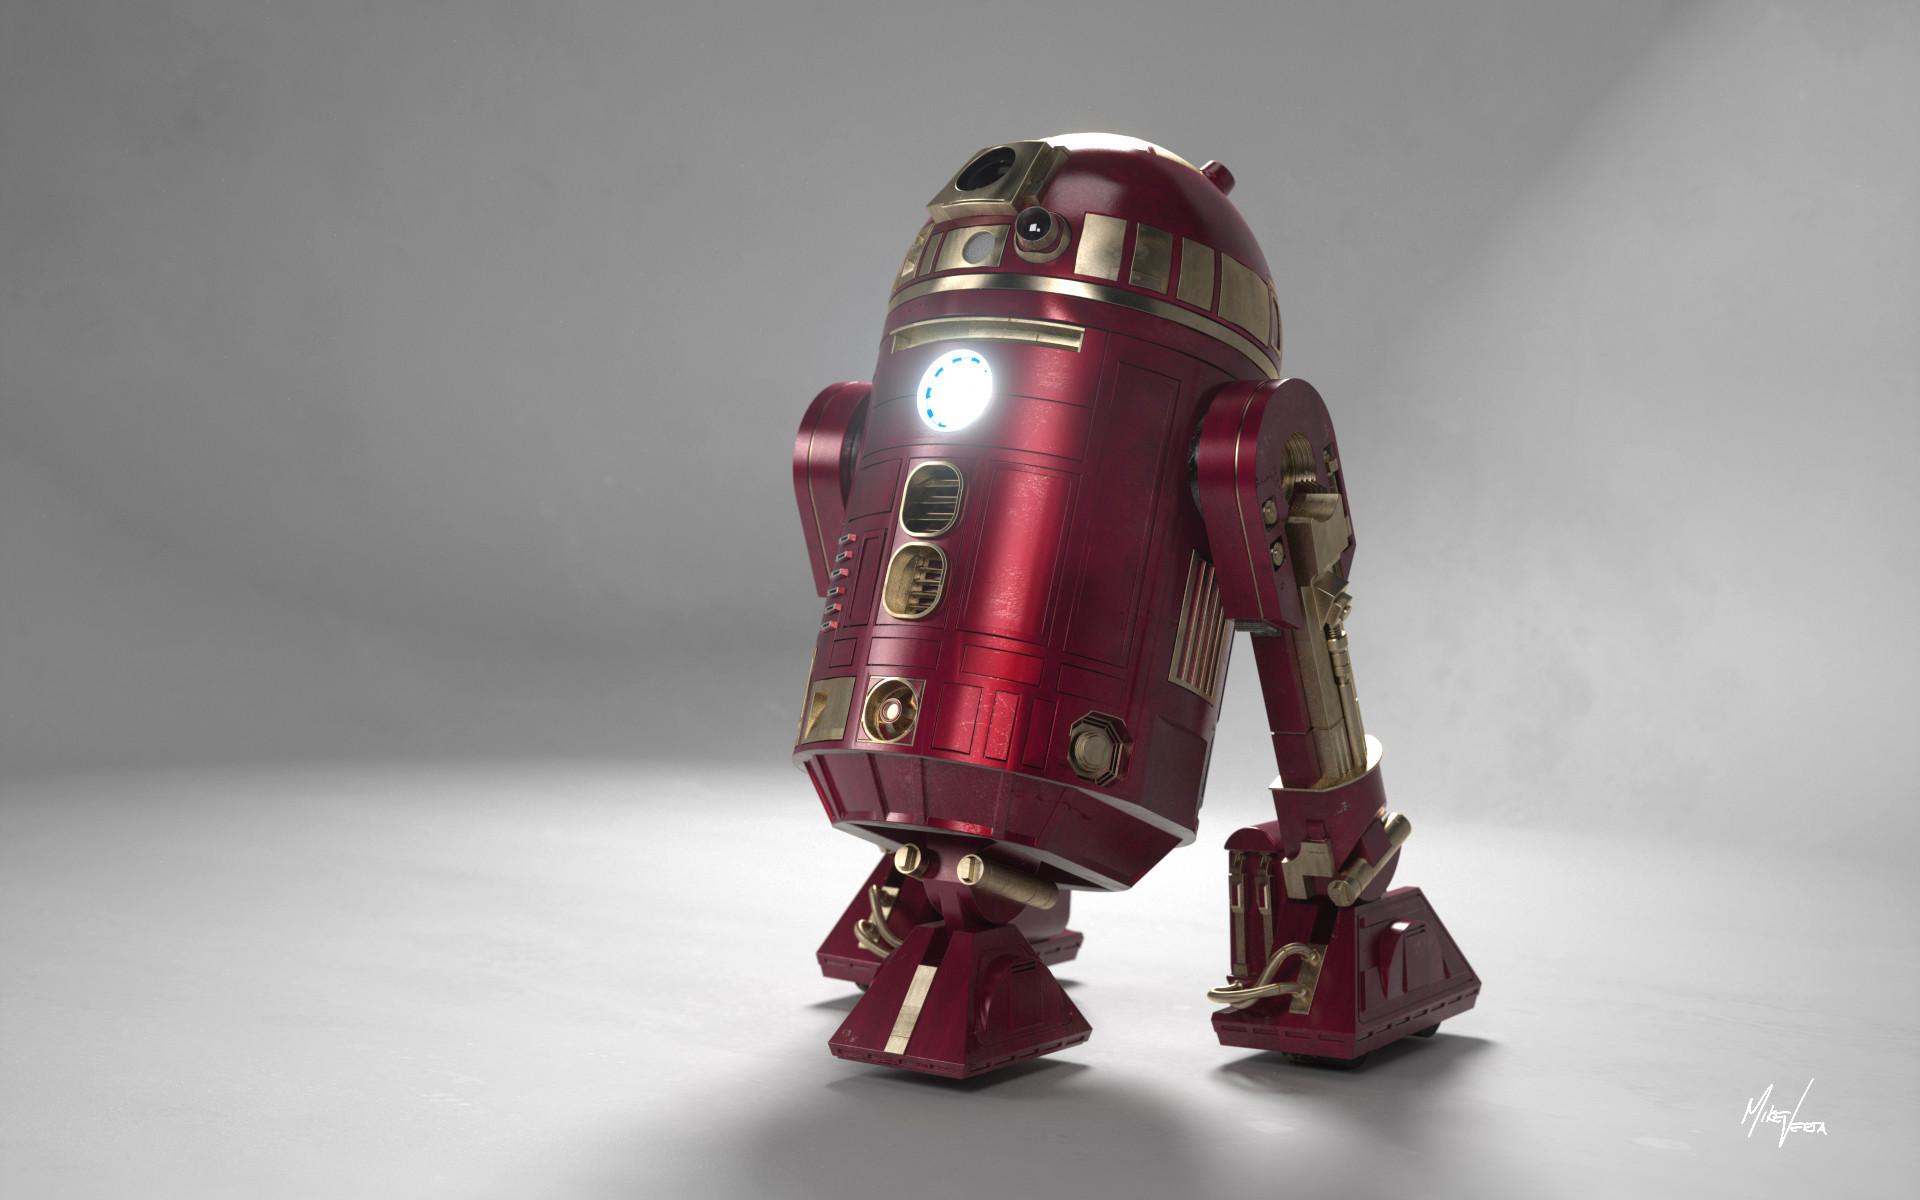 R2d2 And C3po Wallpaper Star Wars R2D2 Wallpap...